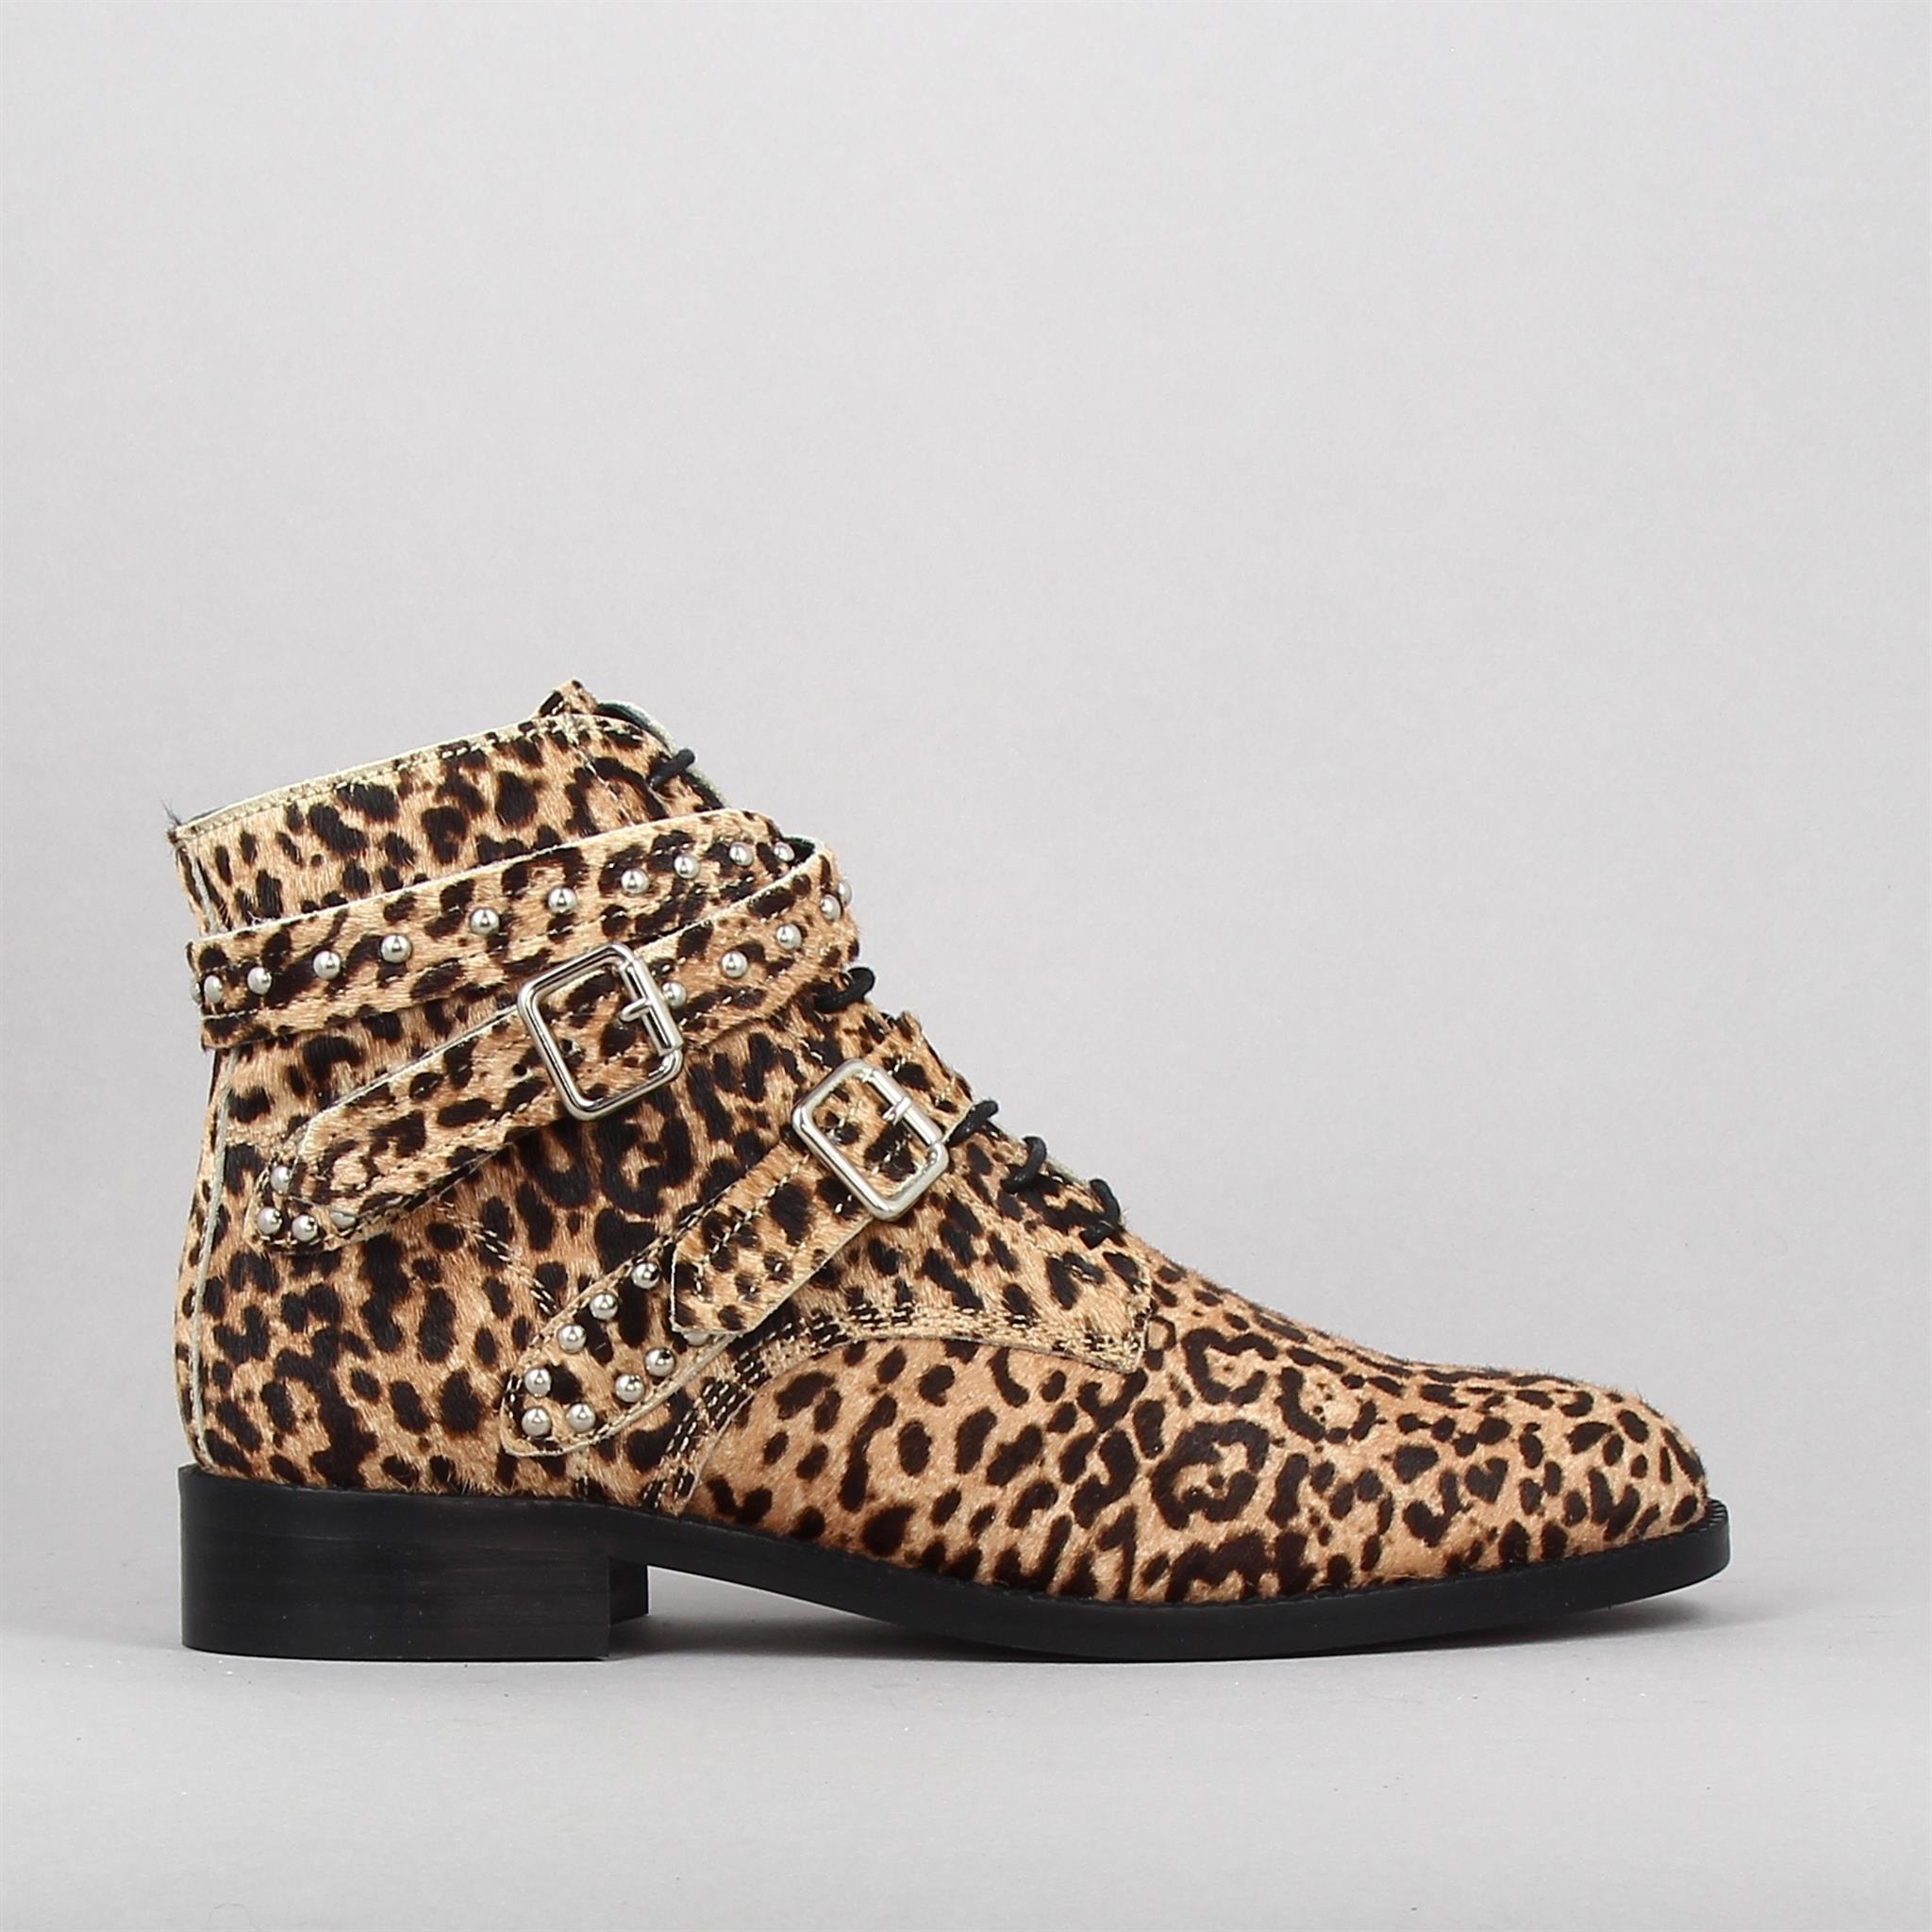 10722-h1819-leopard-3145735-0.jpg